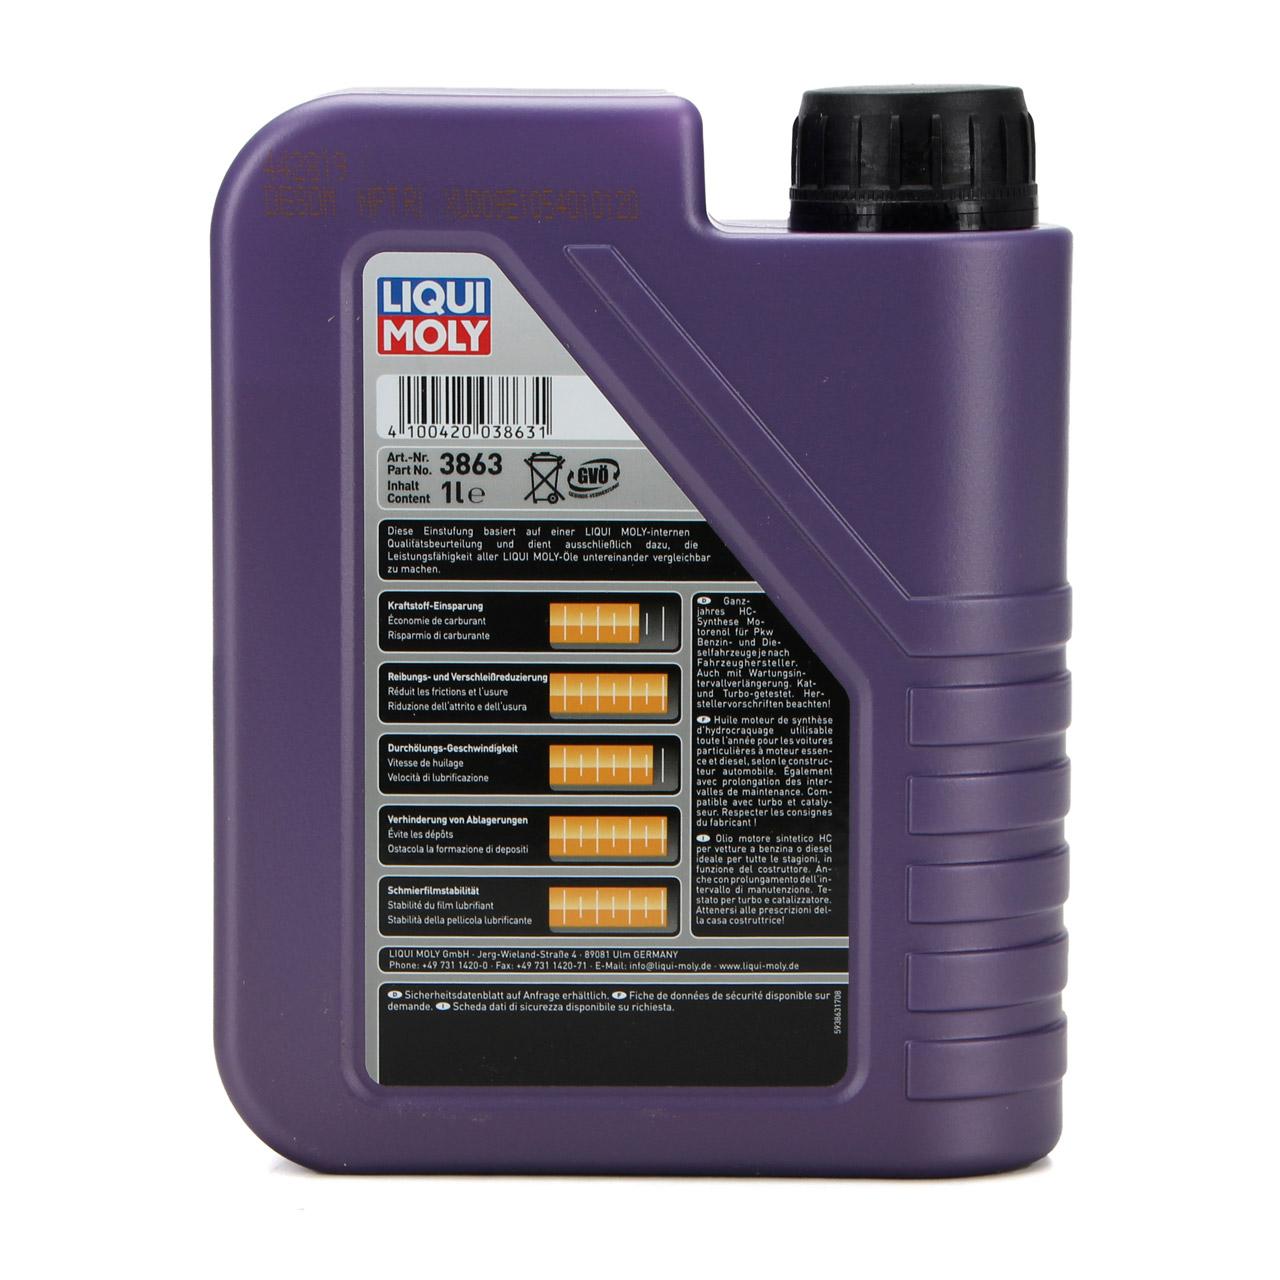 LIQUI MOLY Motoröl Öl Leichtlauf HIGH TECH 5W40 BMW LL-01 MB 229.5 - 1L 1 Liter